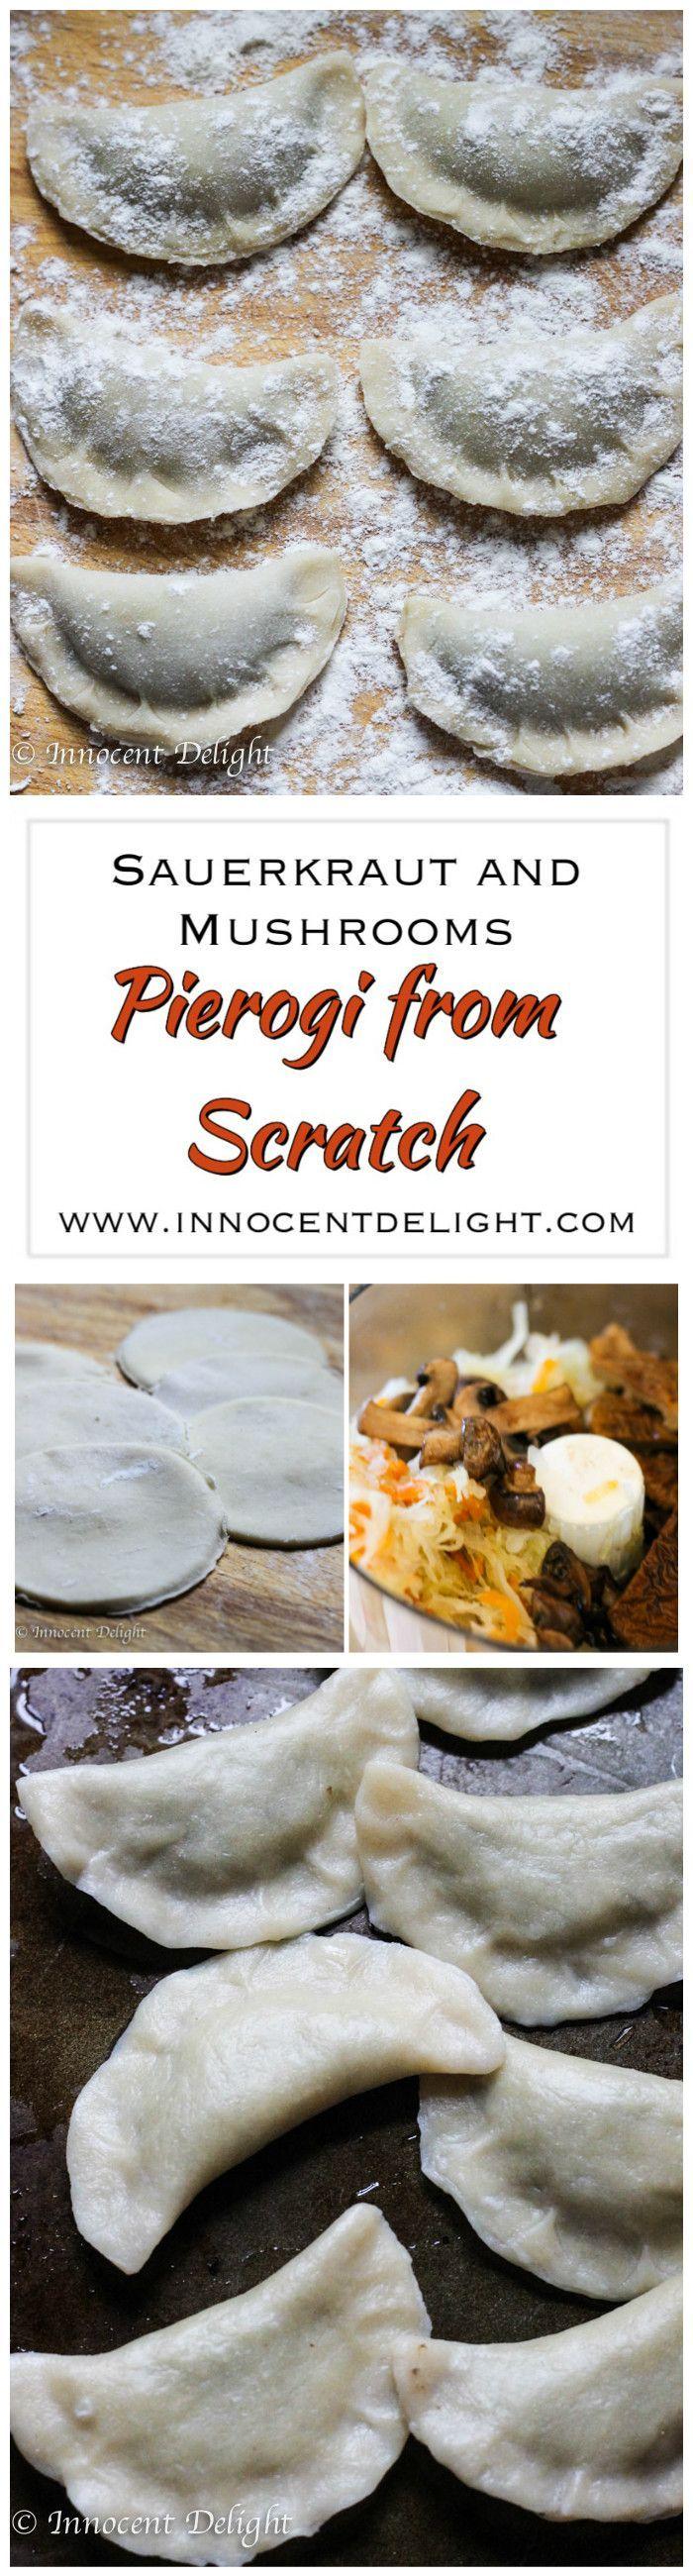 Sauerkraut and Mushrooms Pierogi from Scratch – follow this recipe to learn how pierogi should actually be made.